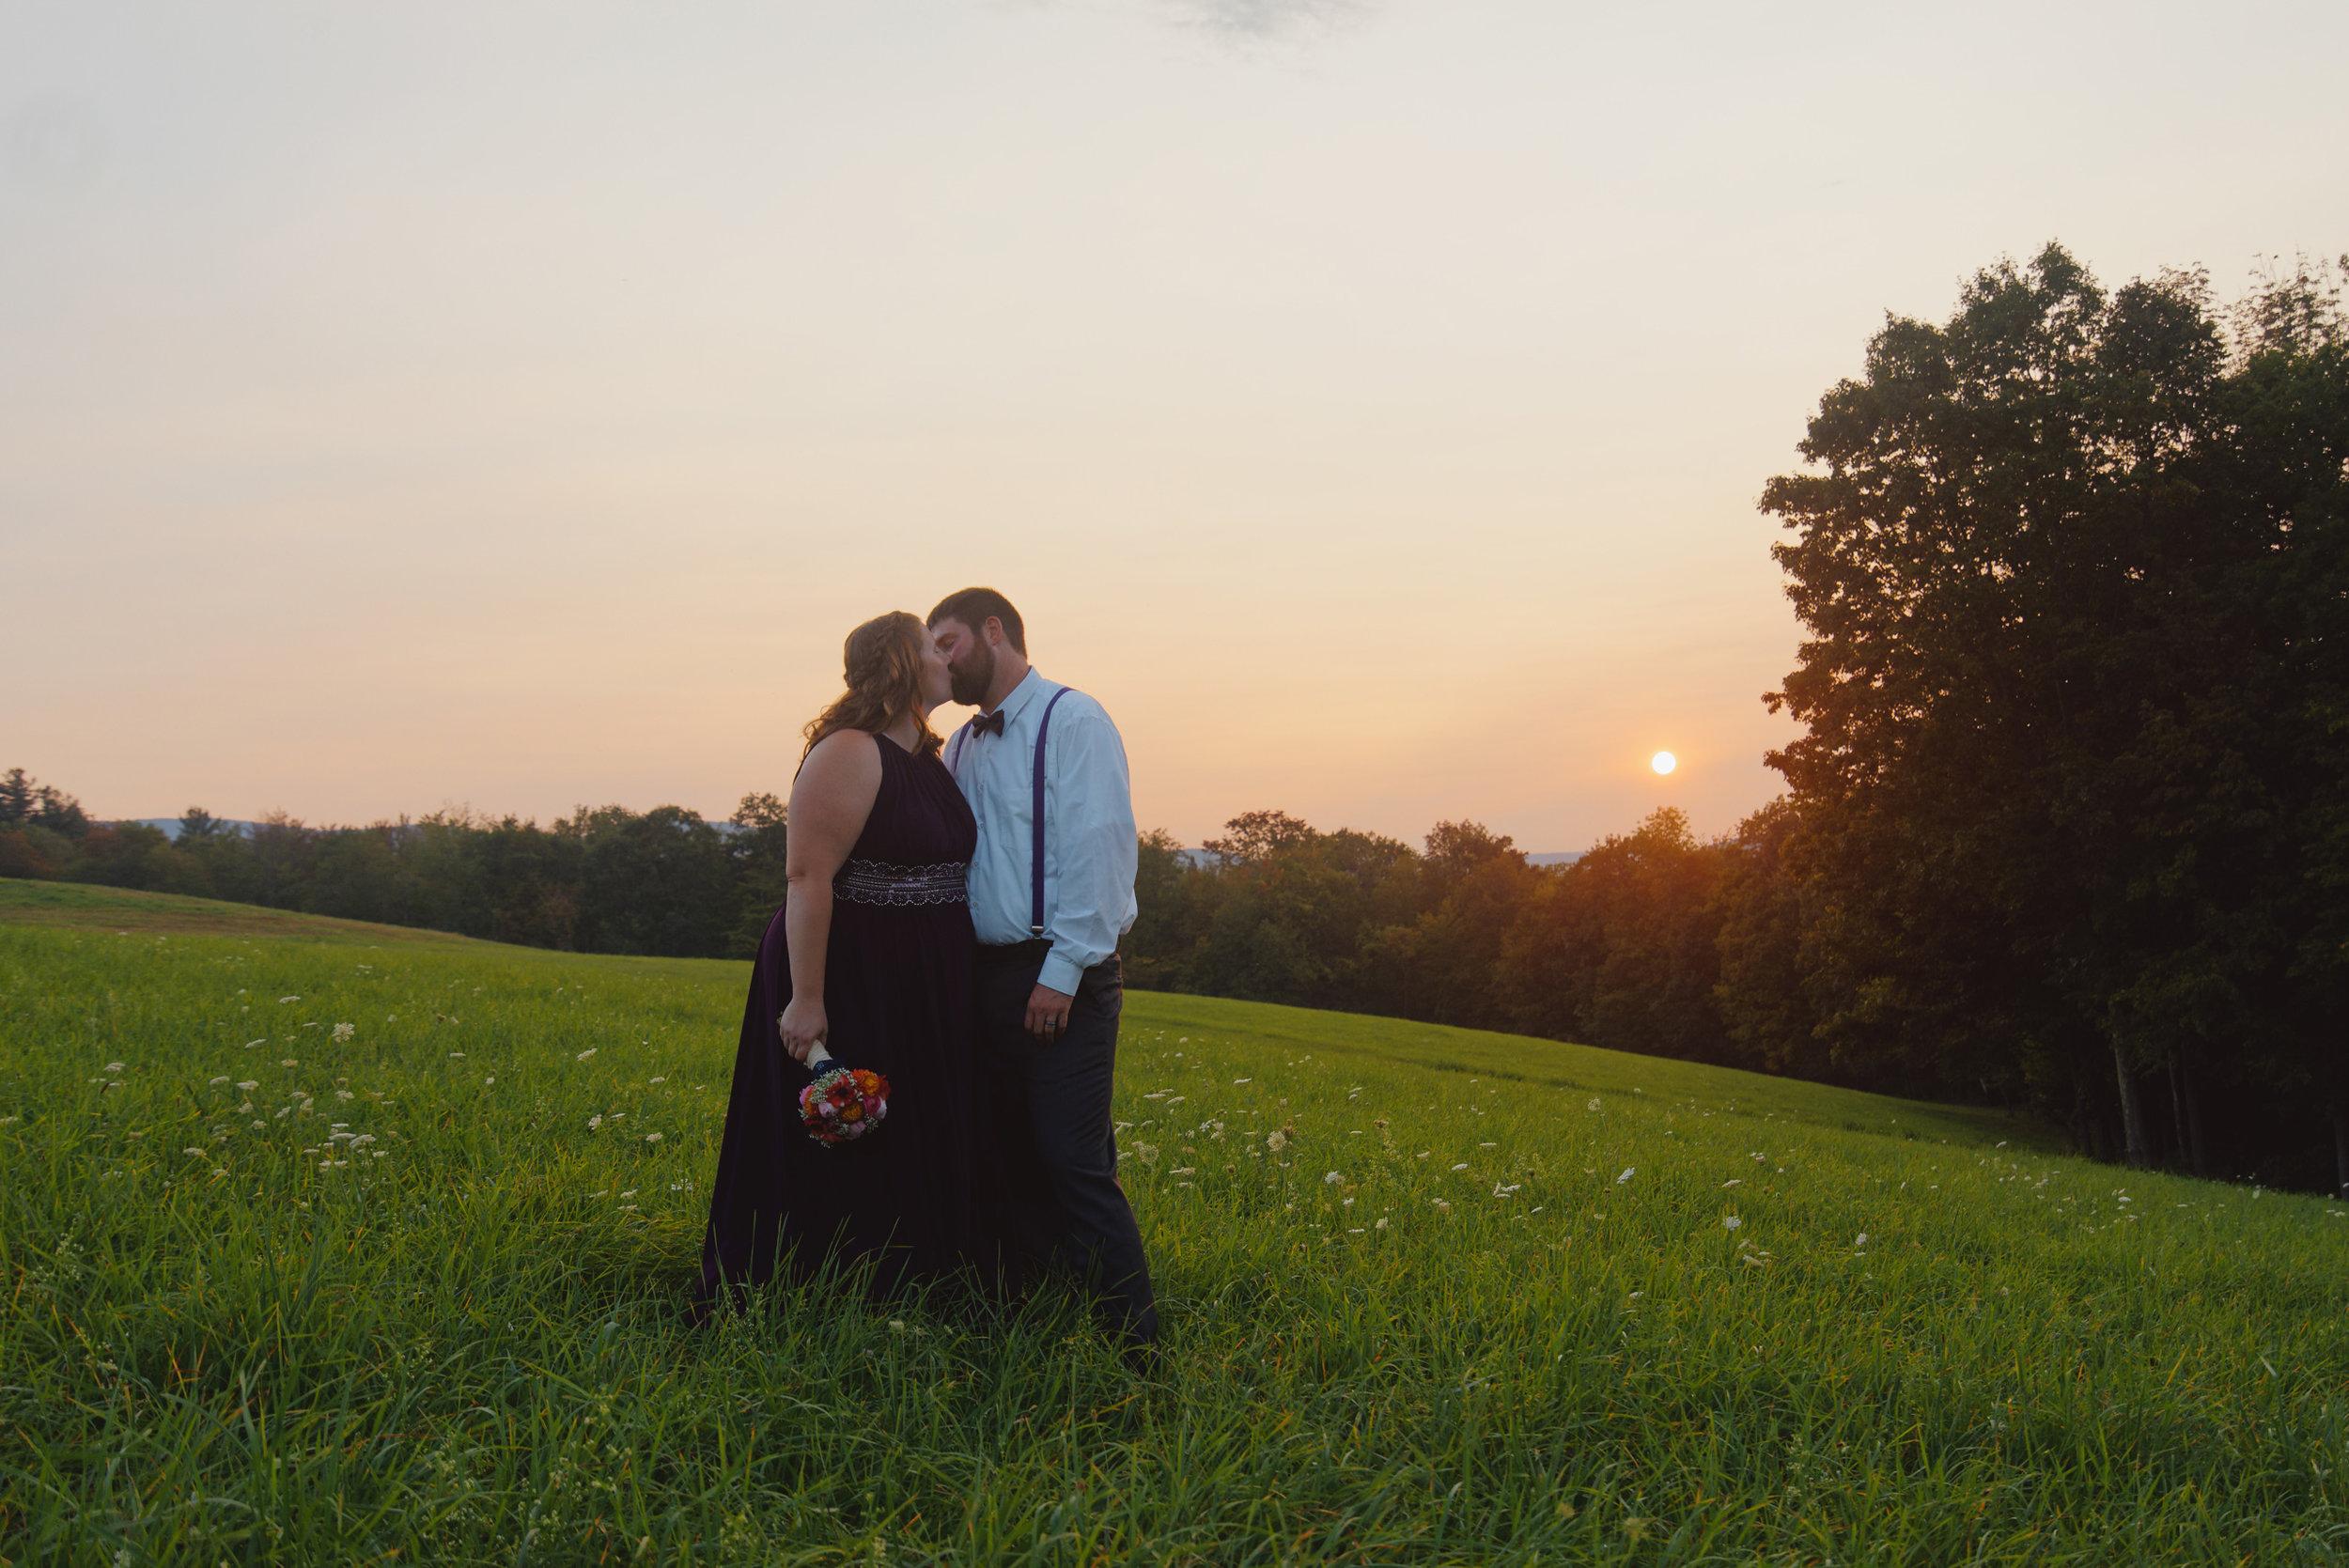 Jenn&Corby_Field_Sunset_Kiss.jpg